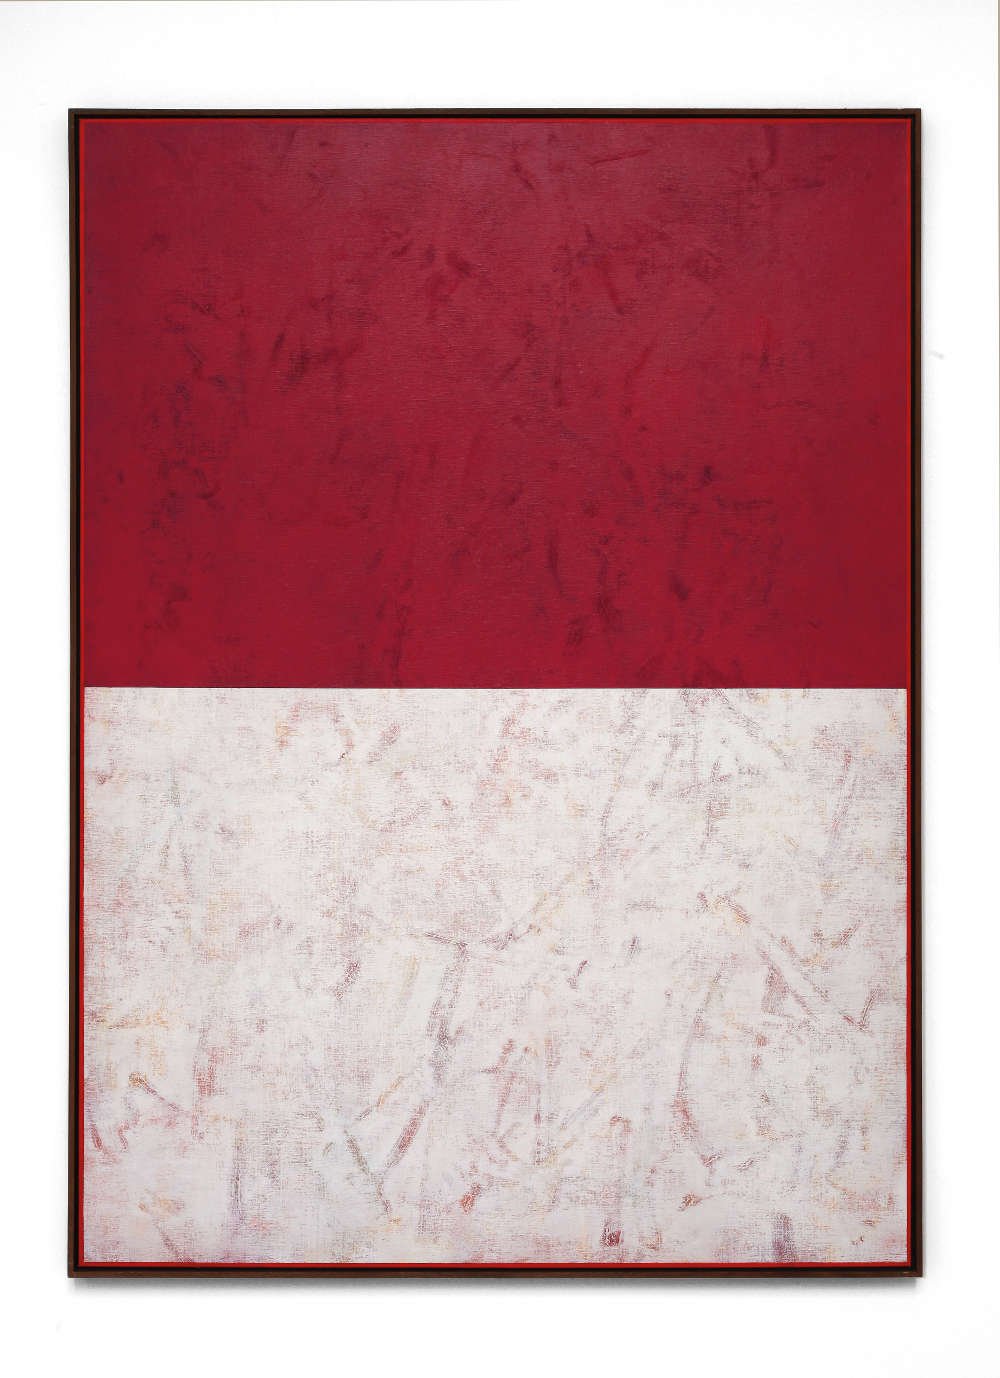 Claudio Verna, Controluce 6, 2011. Acrylic on canvas 160 x 115 cm 62.9 x 45.2 inch.